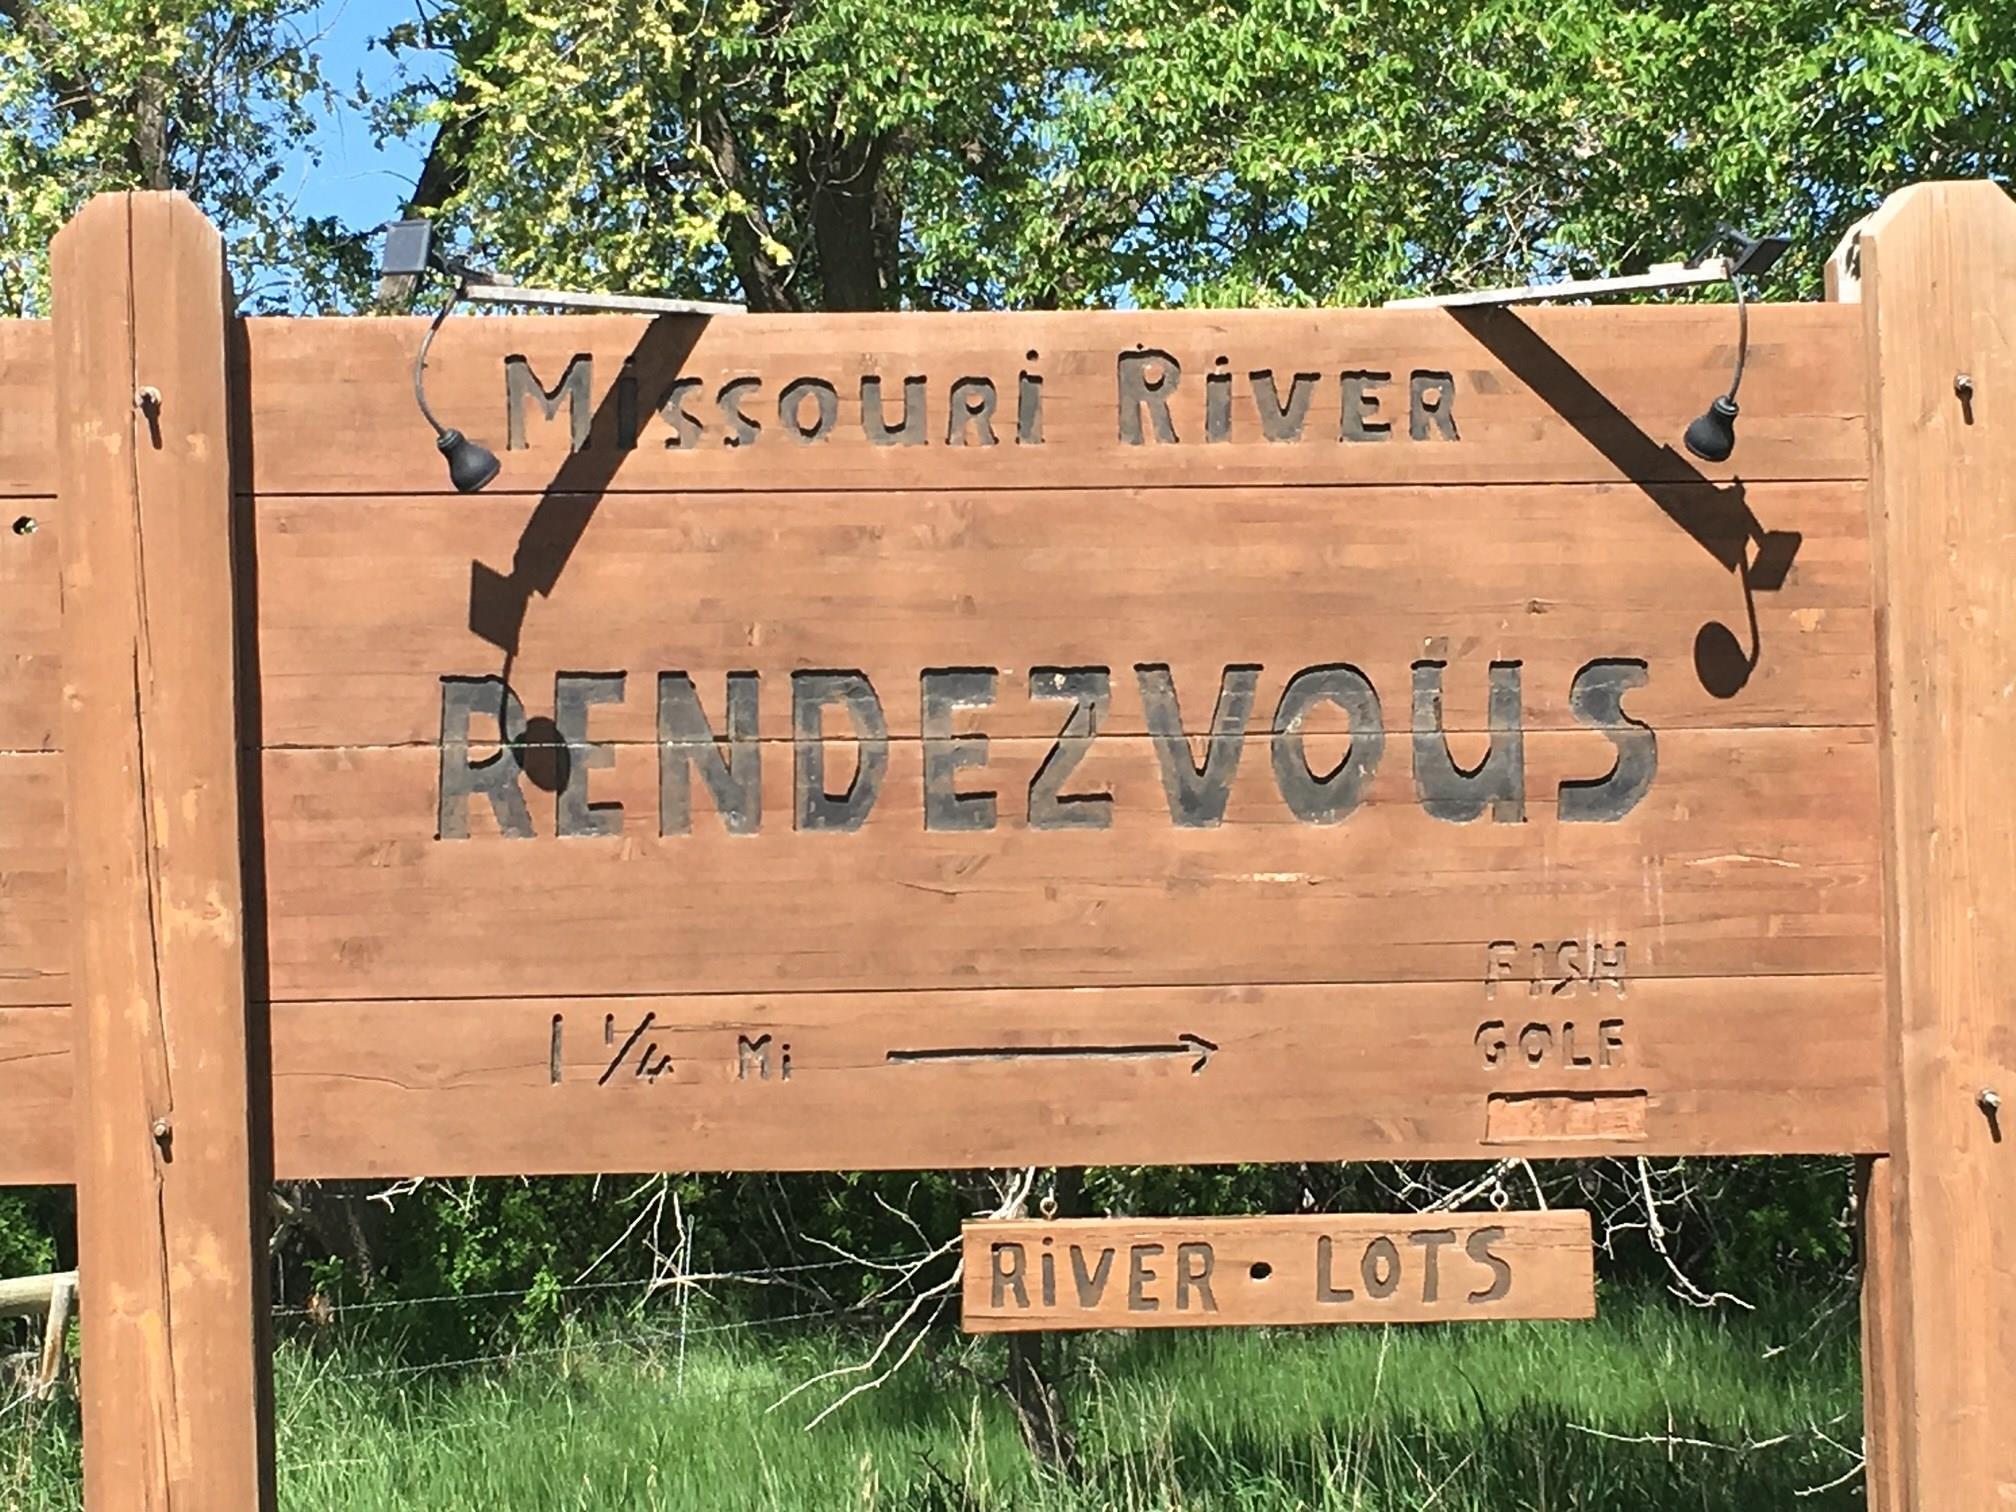 Lot 30 Missouri River Rendezvous, Toston, MT 59643